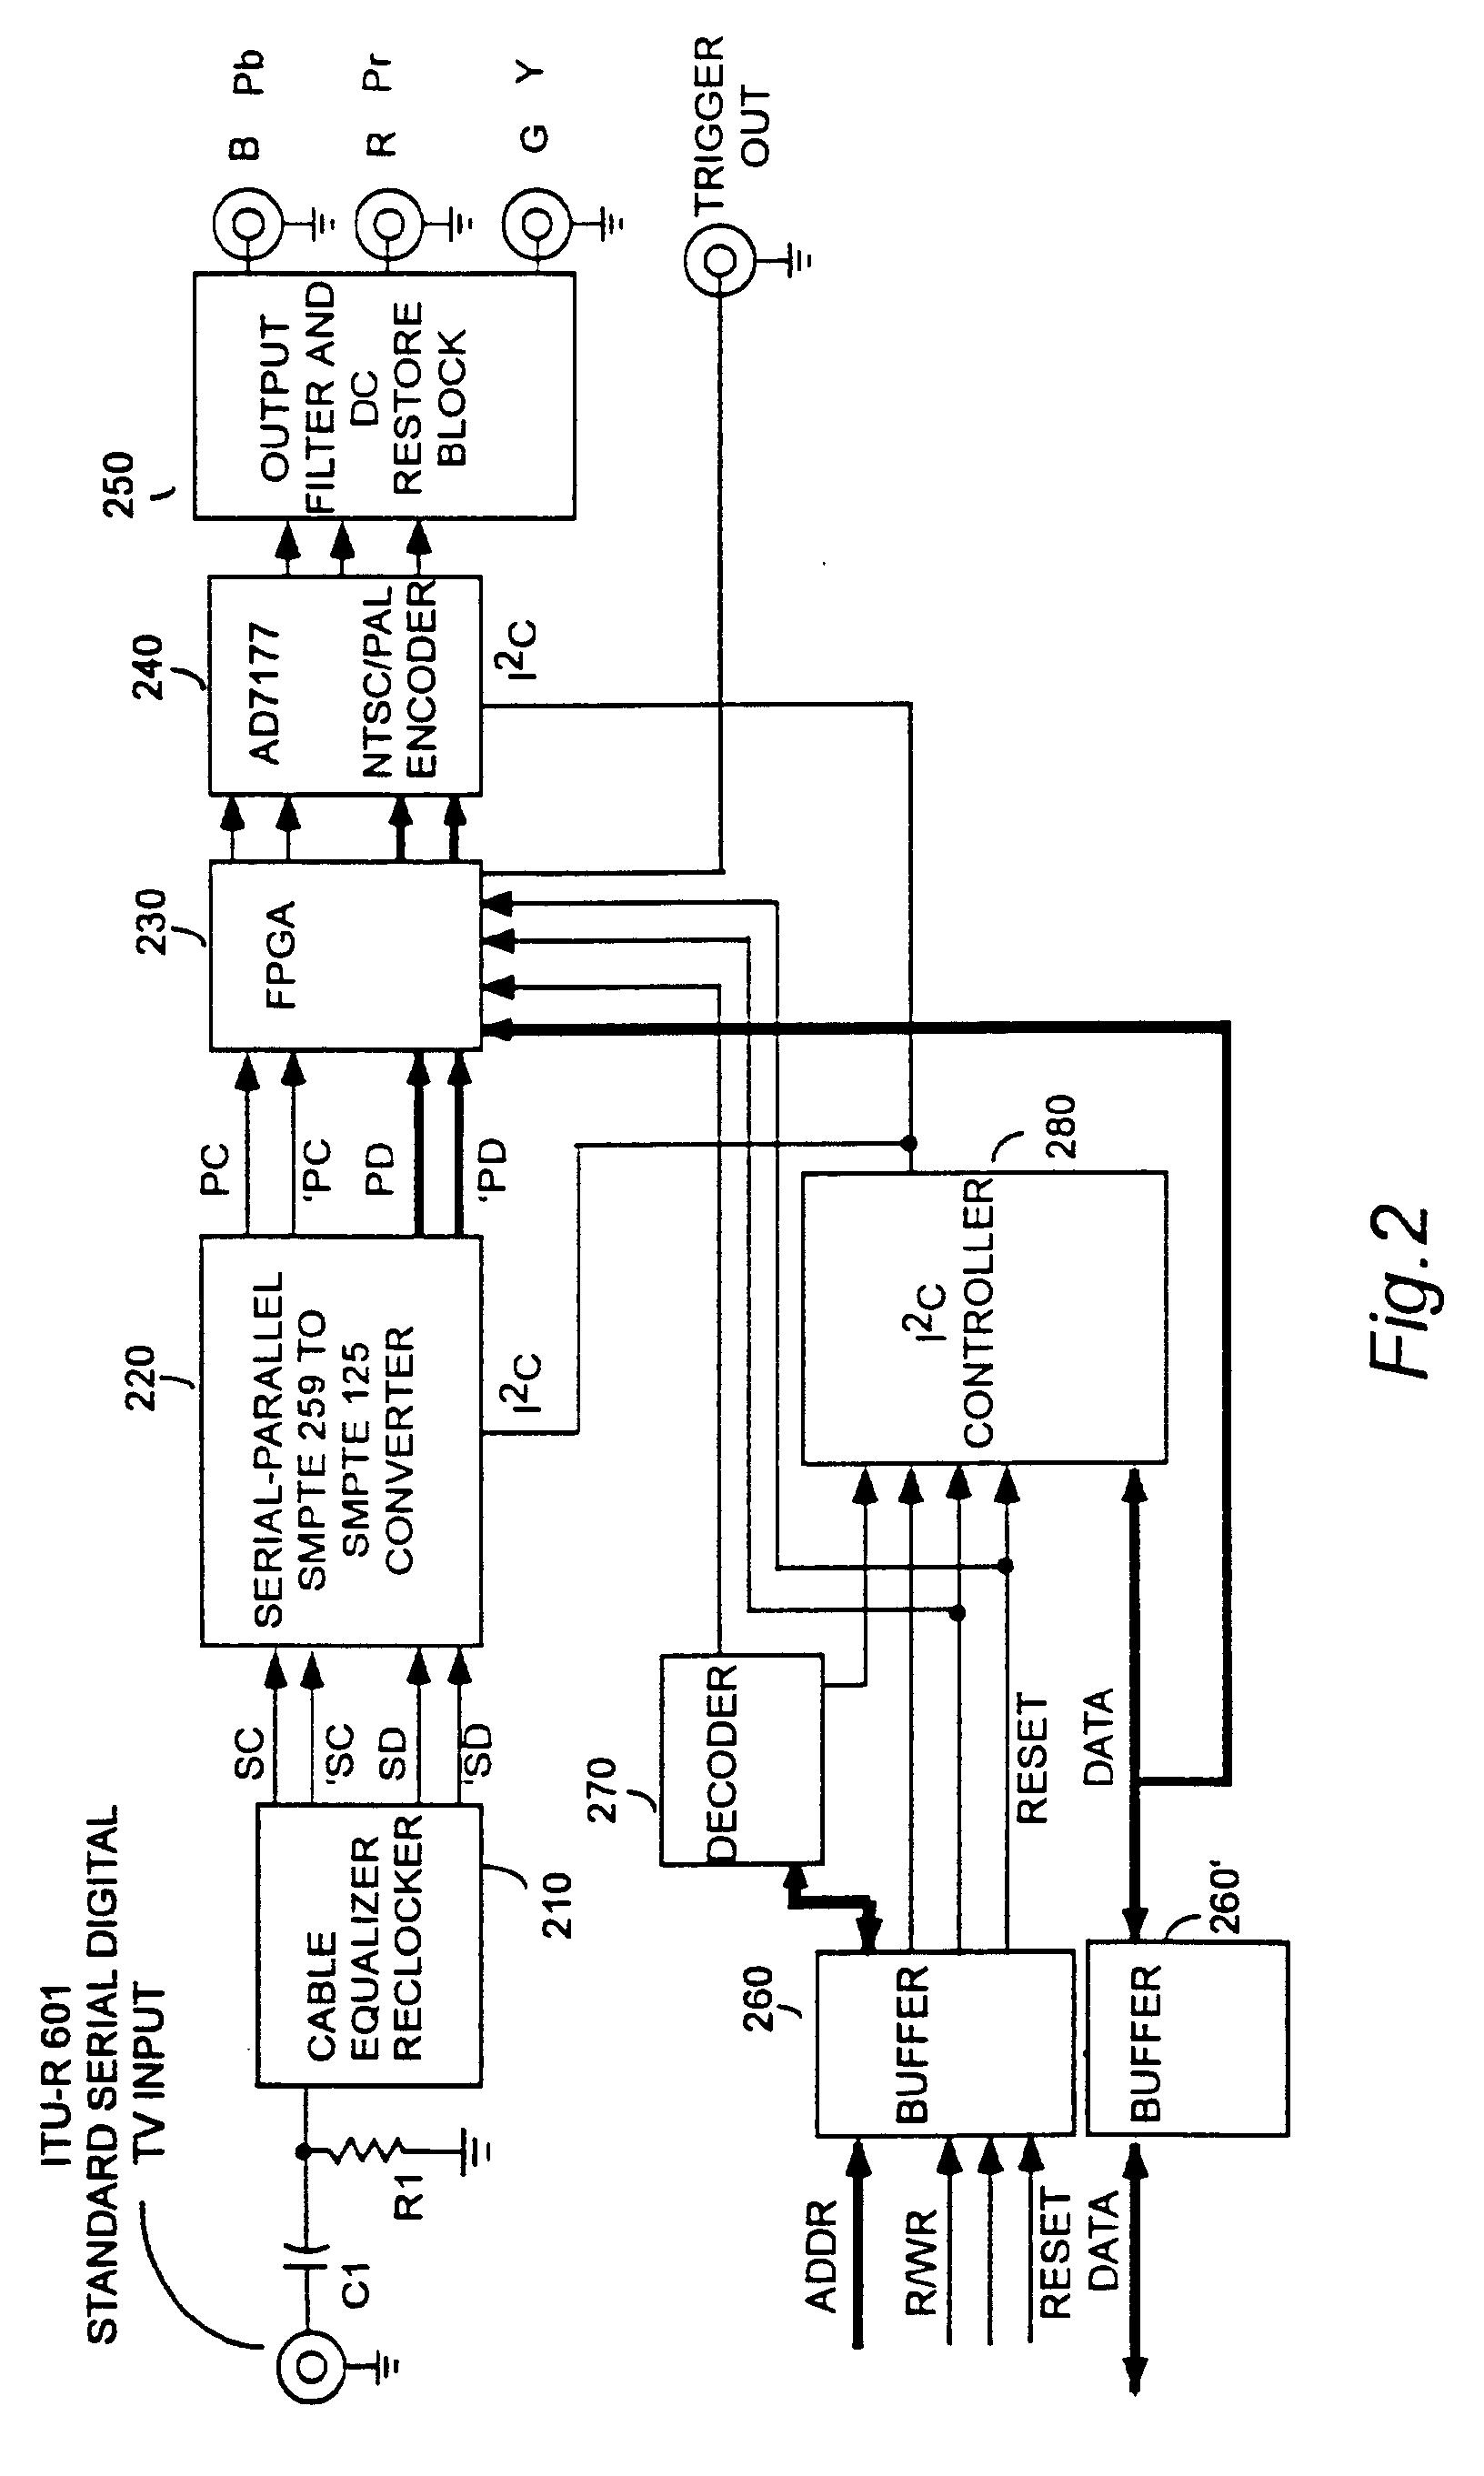 patent ep1139103a1